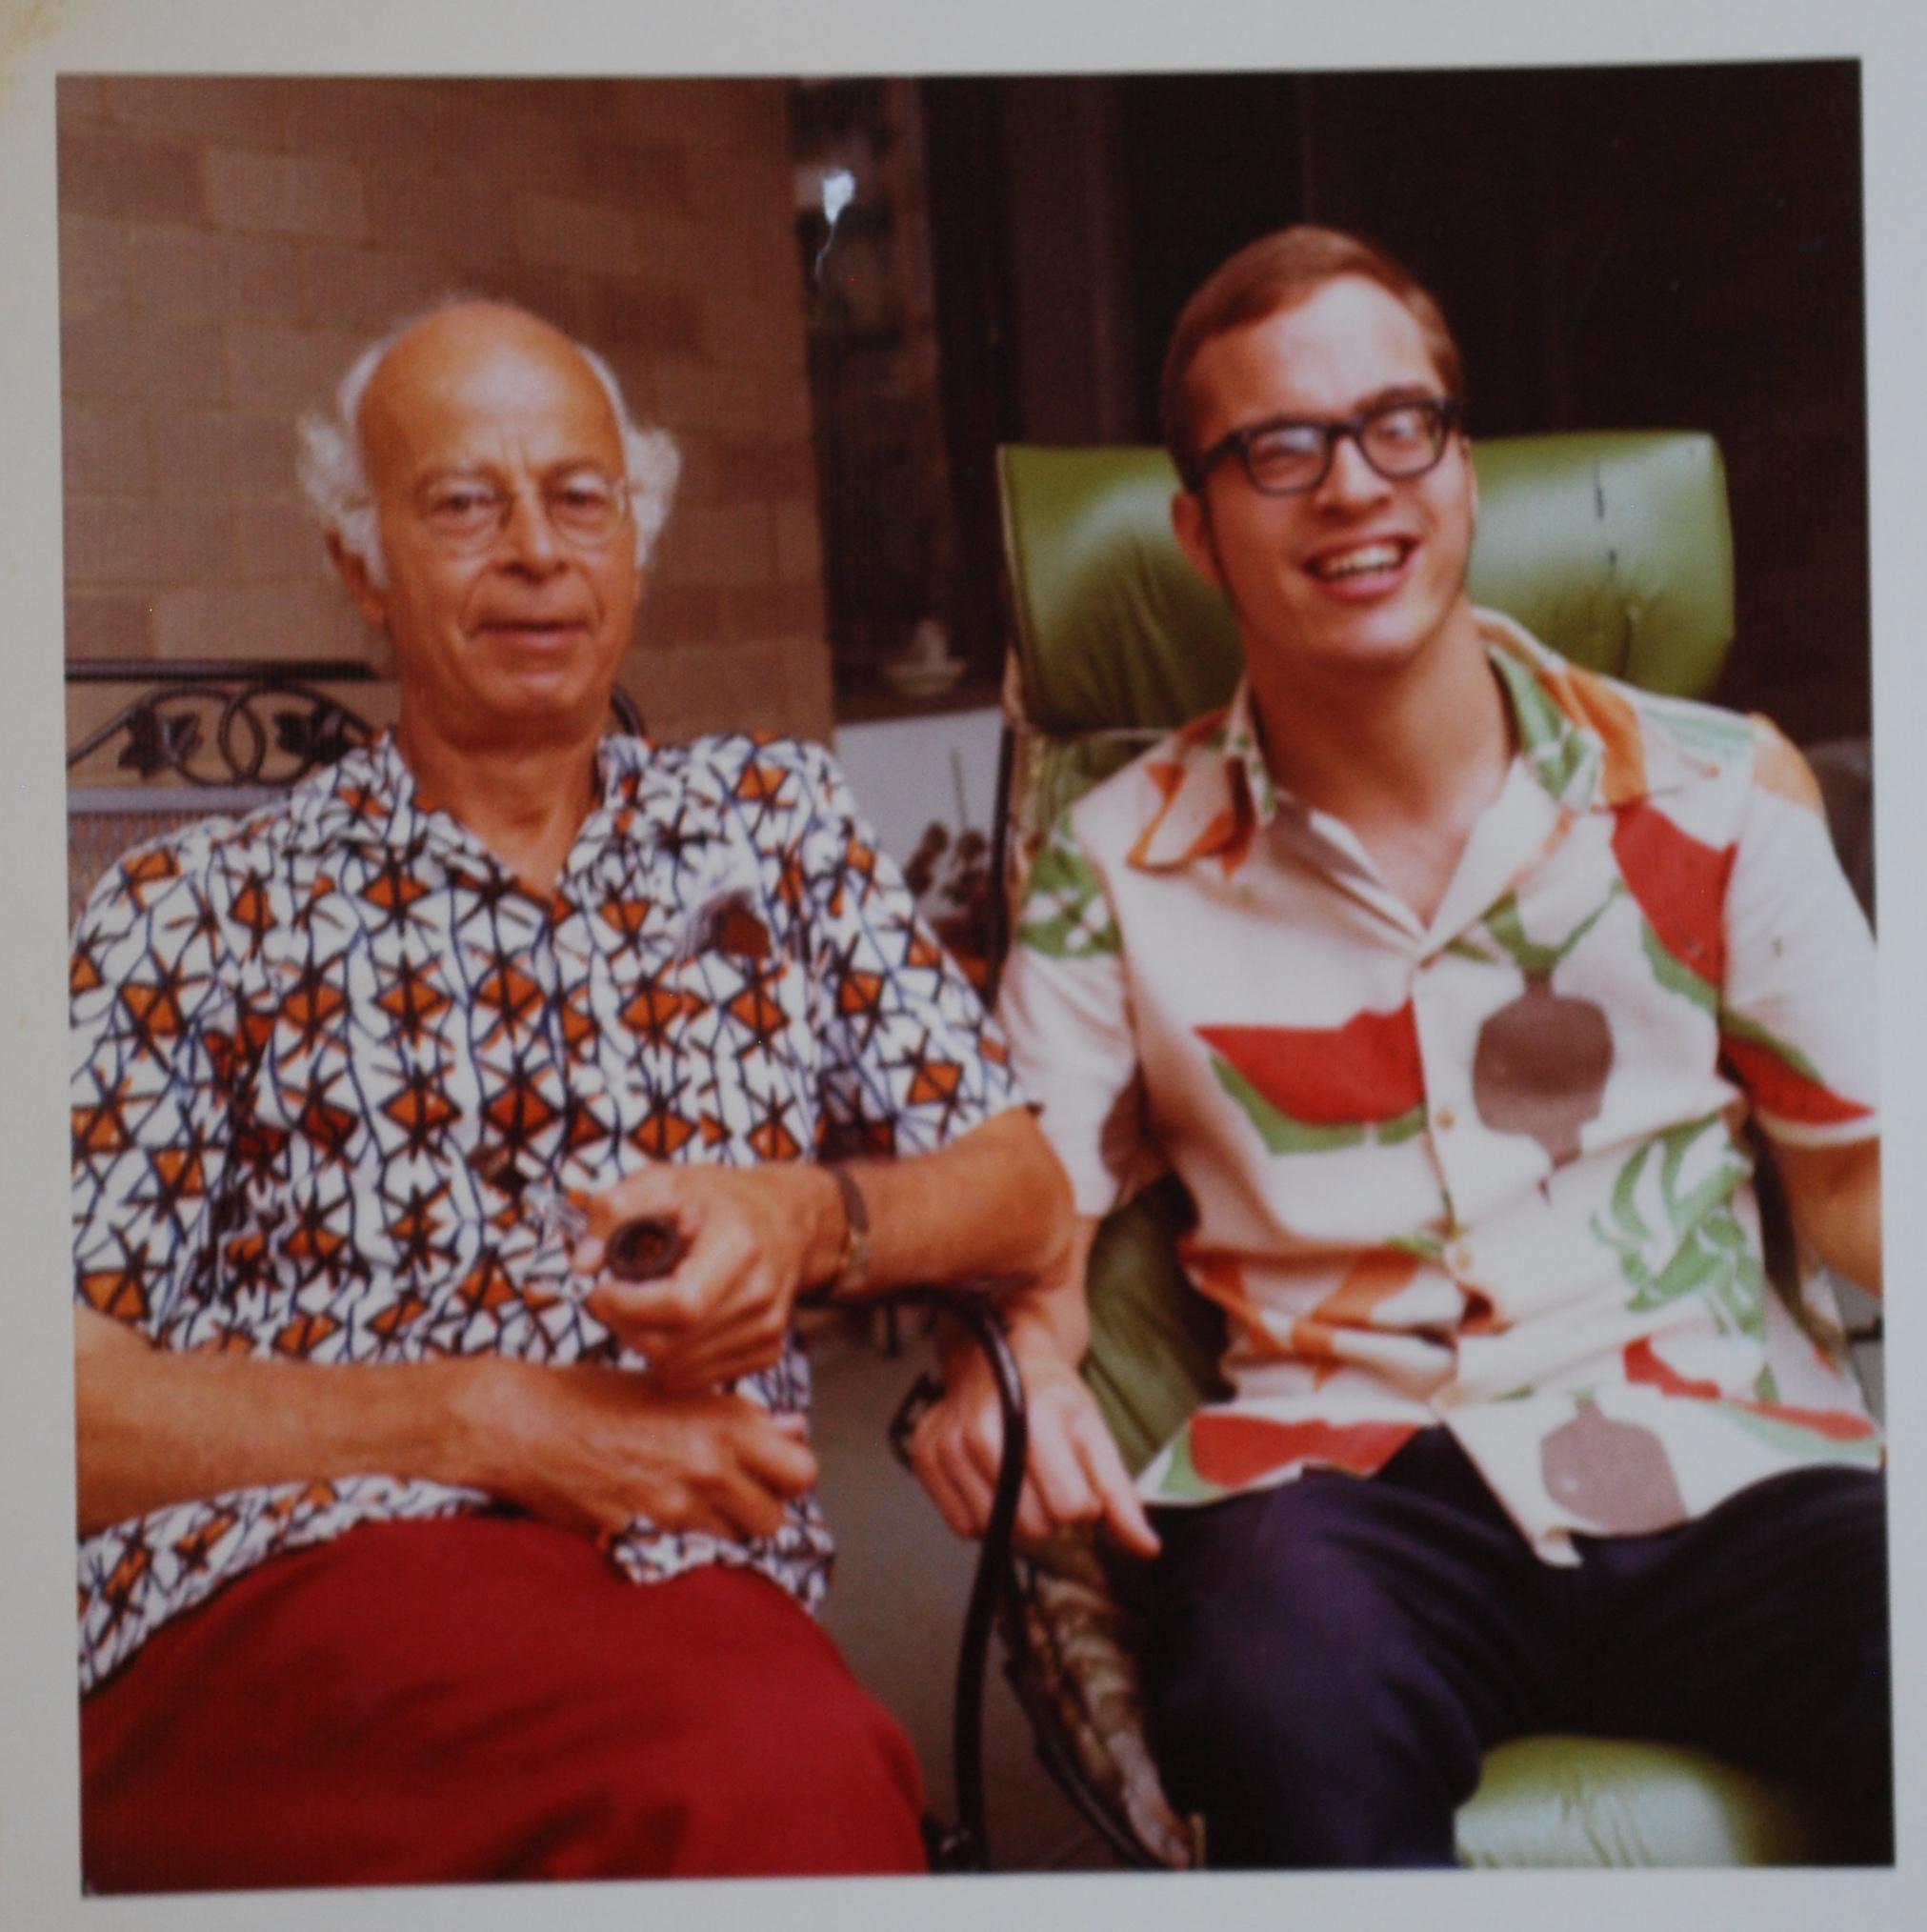 GA Photo Gene and Dad DSC_1895.JPG